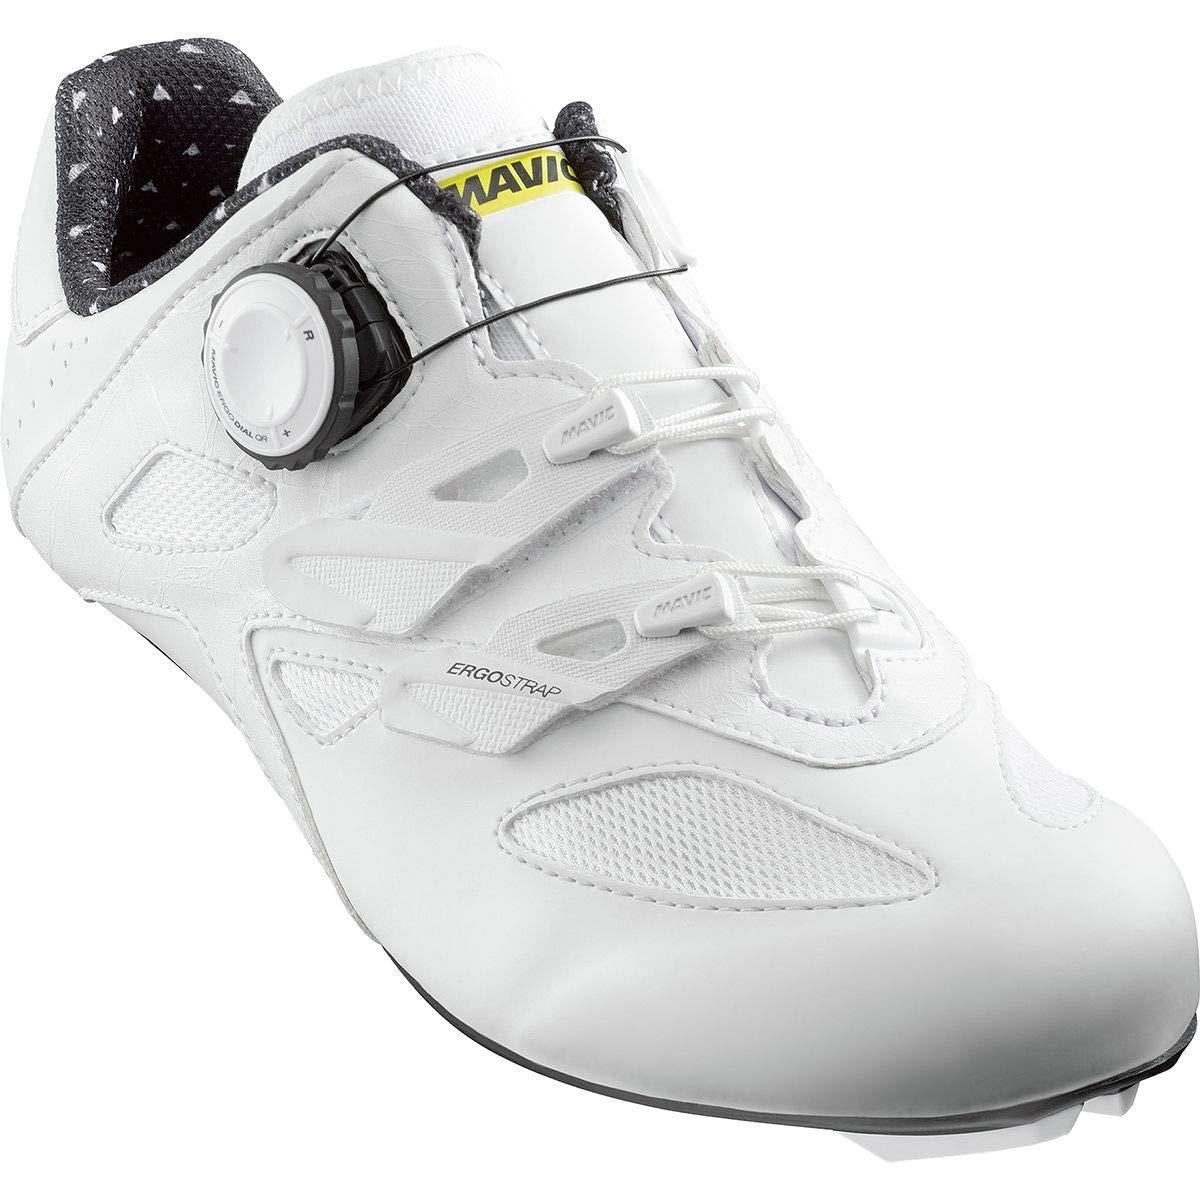 Womens Mavic Sequence Elite Cycling Shoe